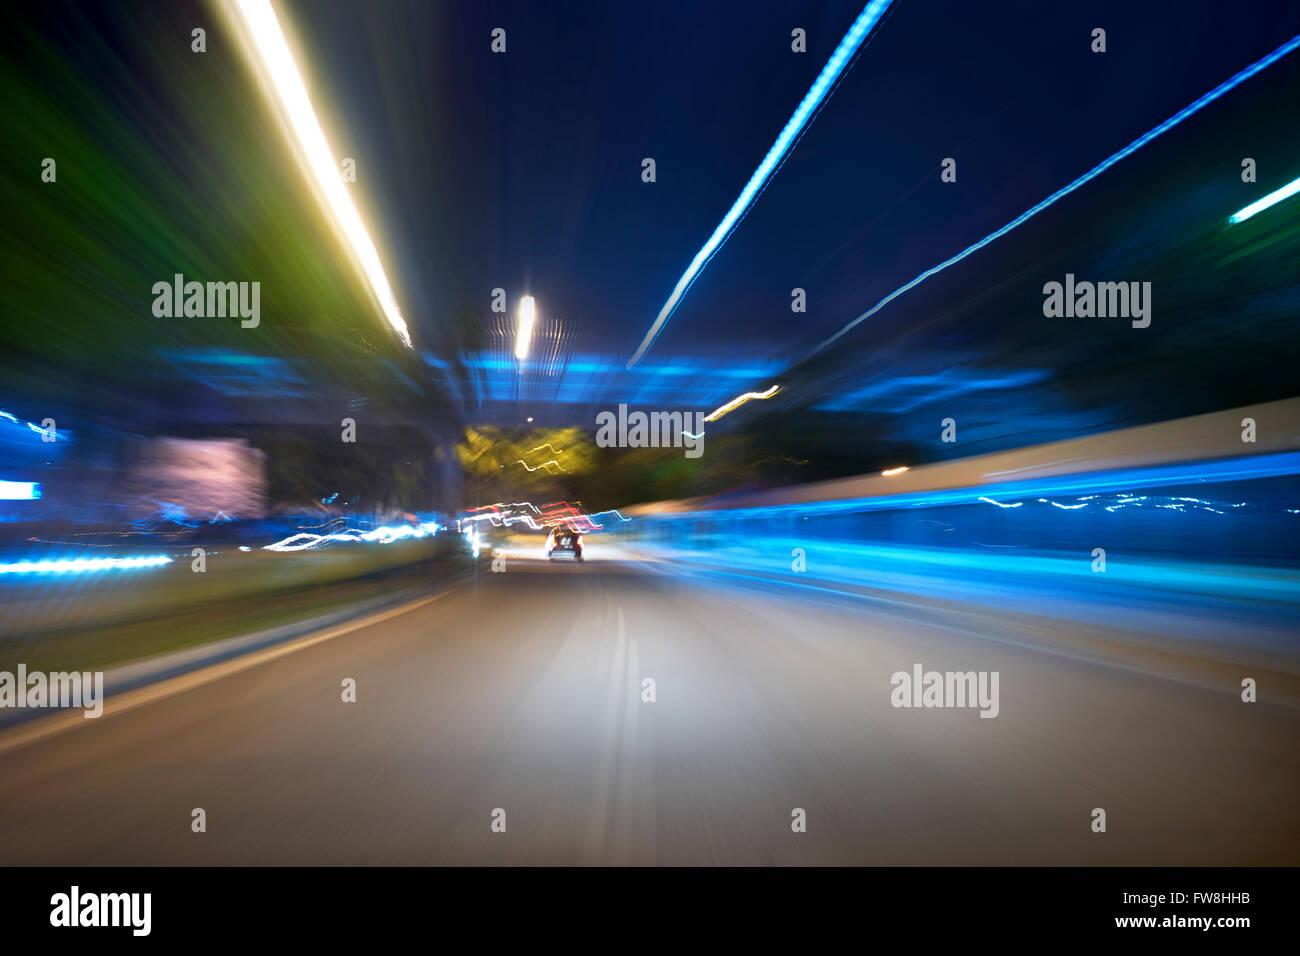 moving forward motion blur background,night scene - Stock Image